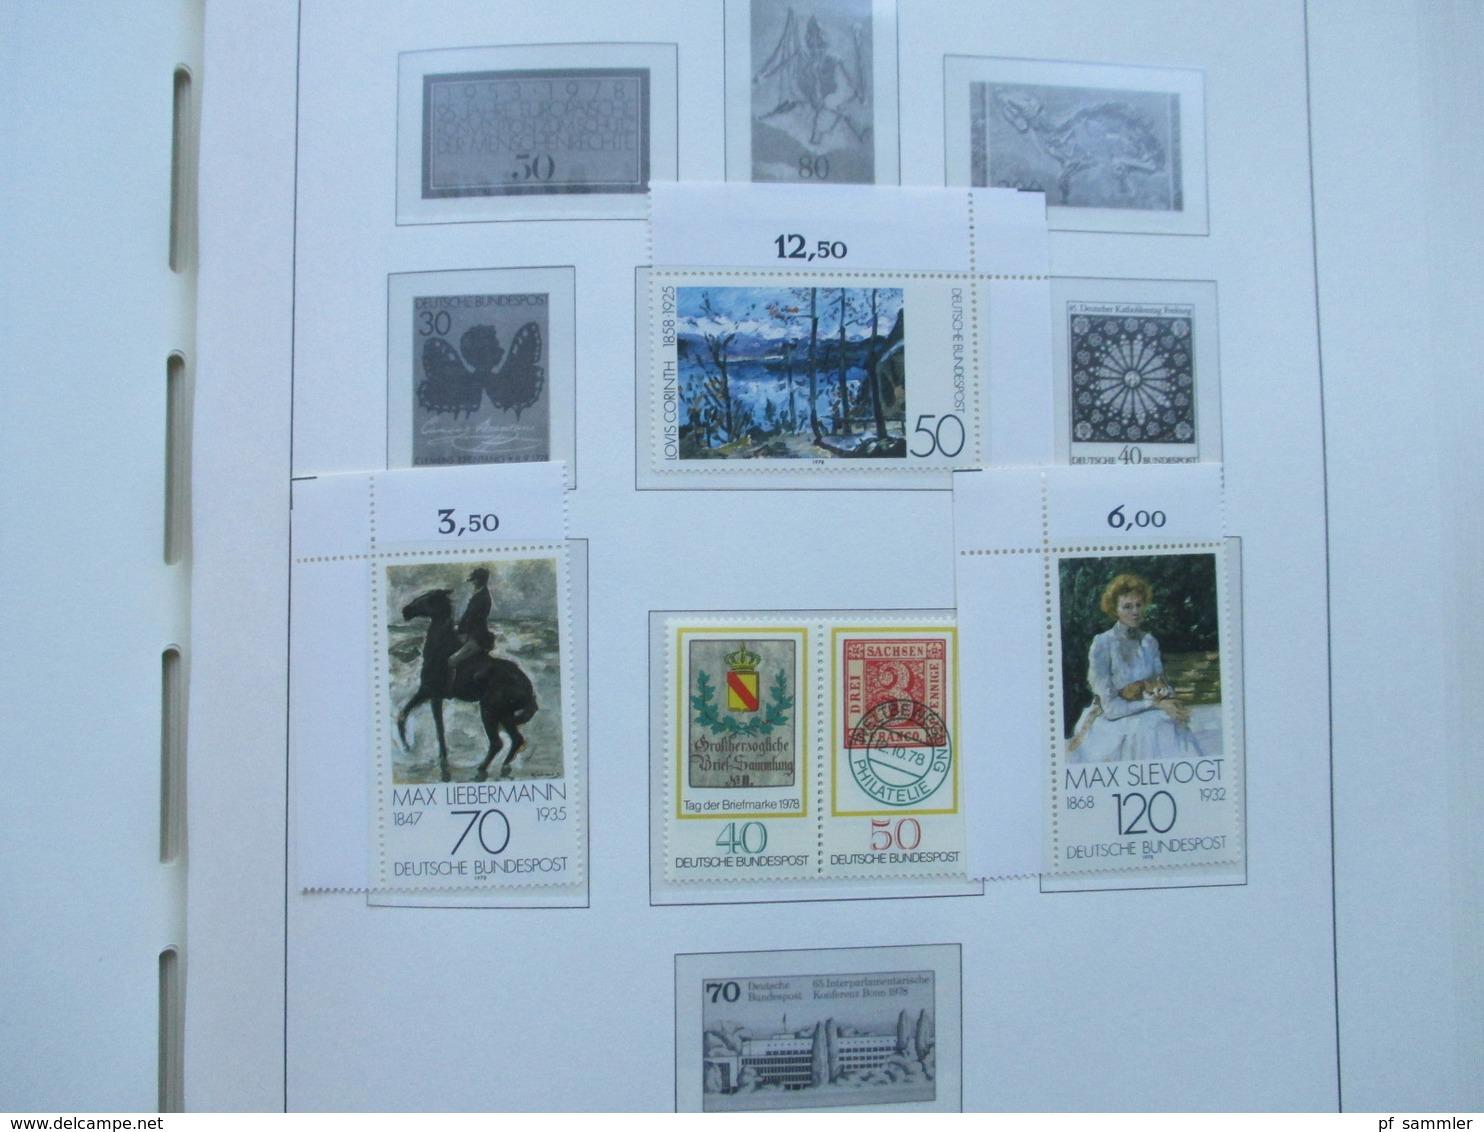 BRD Slg. In 2 Leuchtturm VD Alben Vordrucke 1949 - 2001 Anfangs Gestempelt, Ab Ende 60er Jahre - 2000 Fast Komplett ** - Timbres